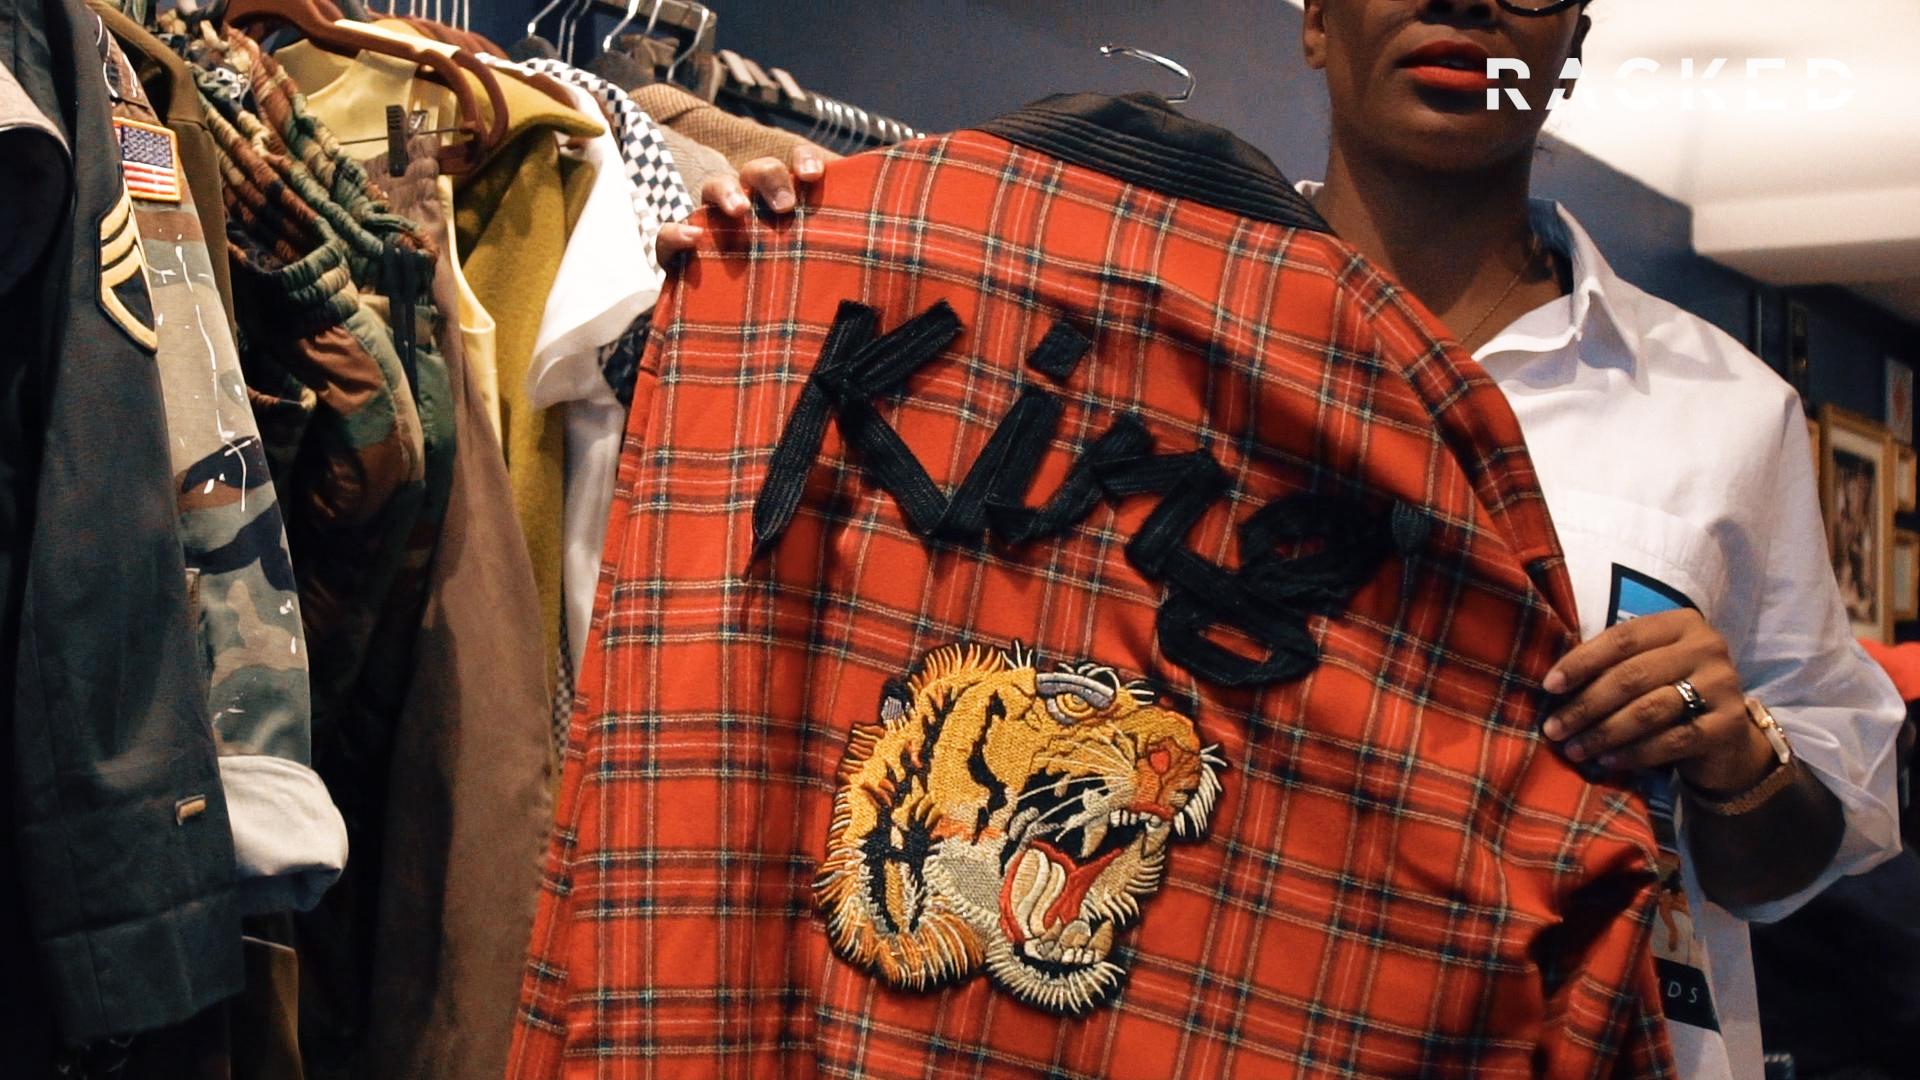 Close-up of a jacket at Harlem Haberdashery